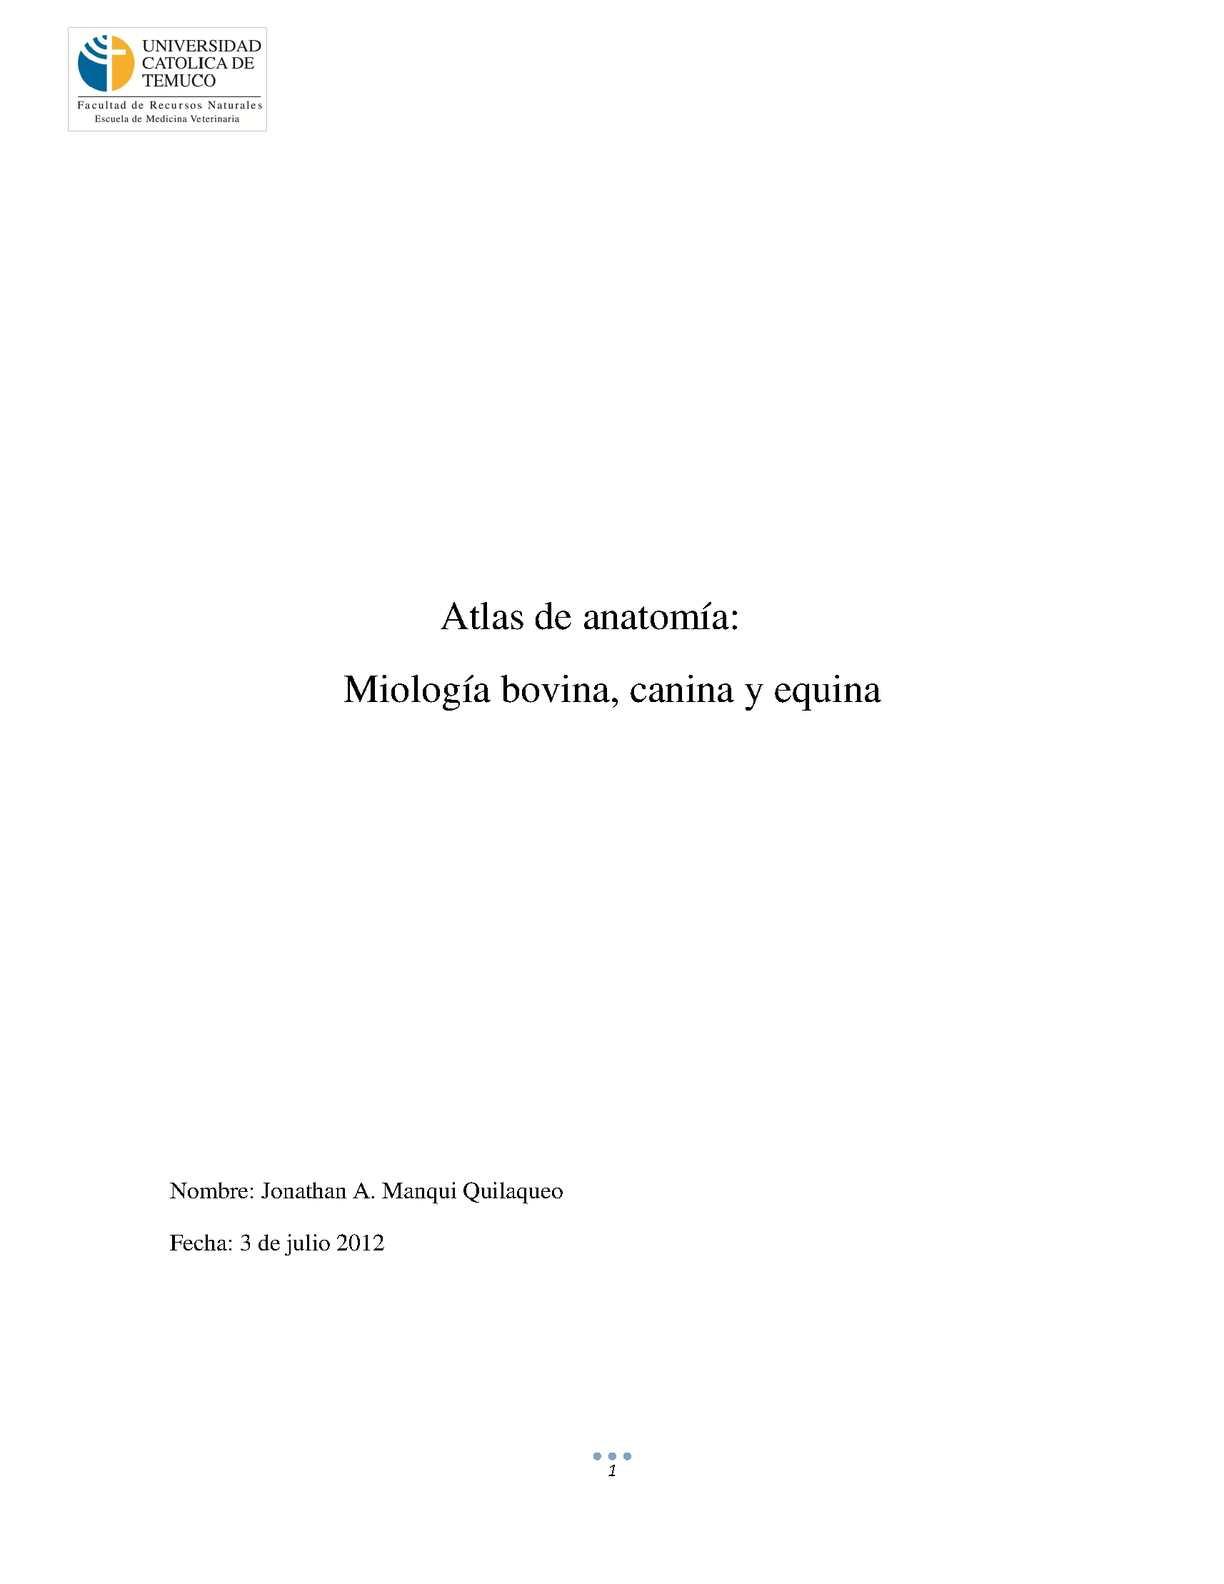 Calaméo - Miologia de bovino, equino y canino